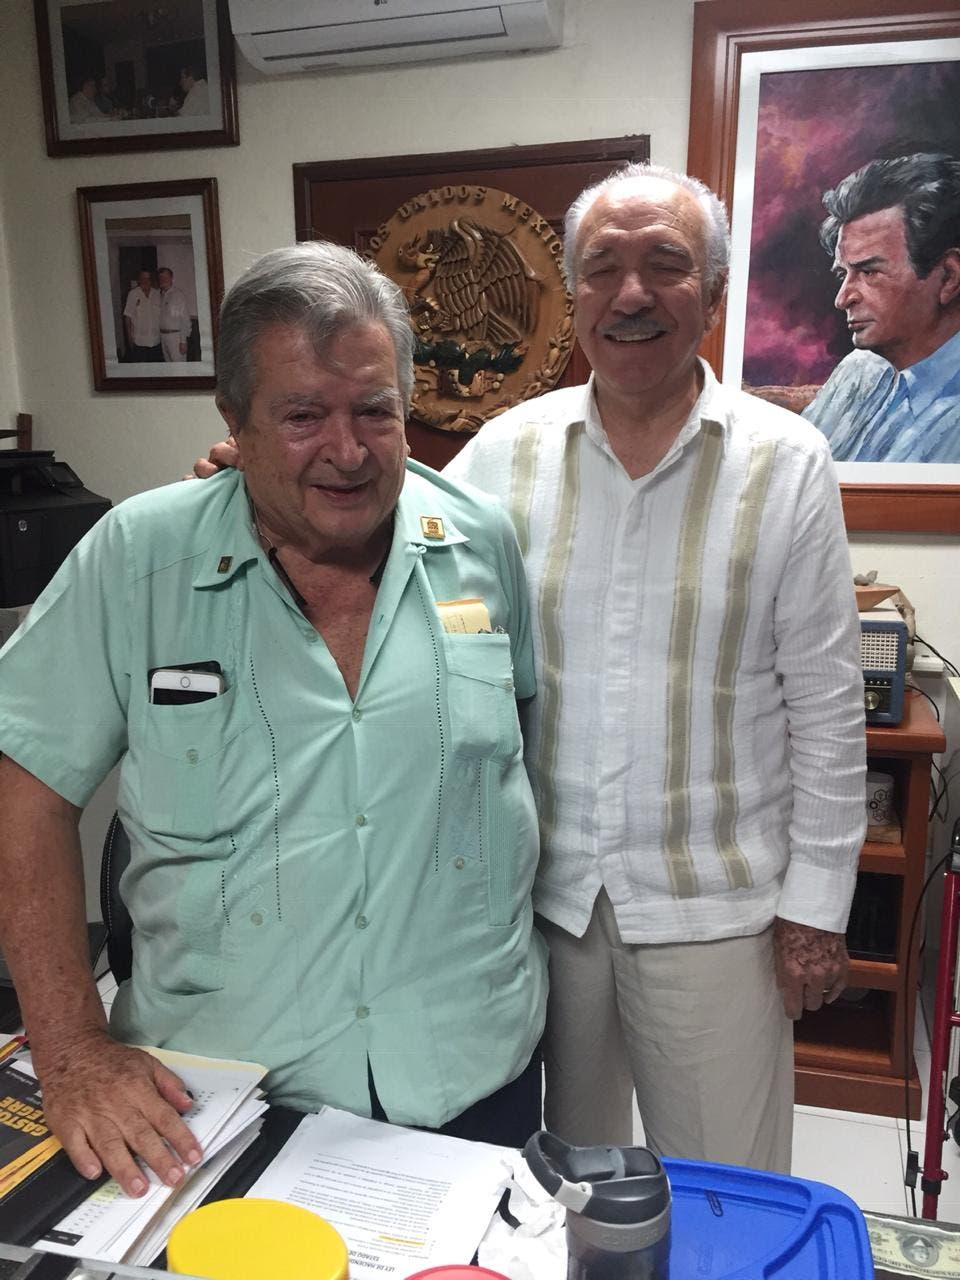 Se reúnen Don Gastón Alegre y Ricardo Acedo